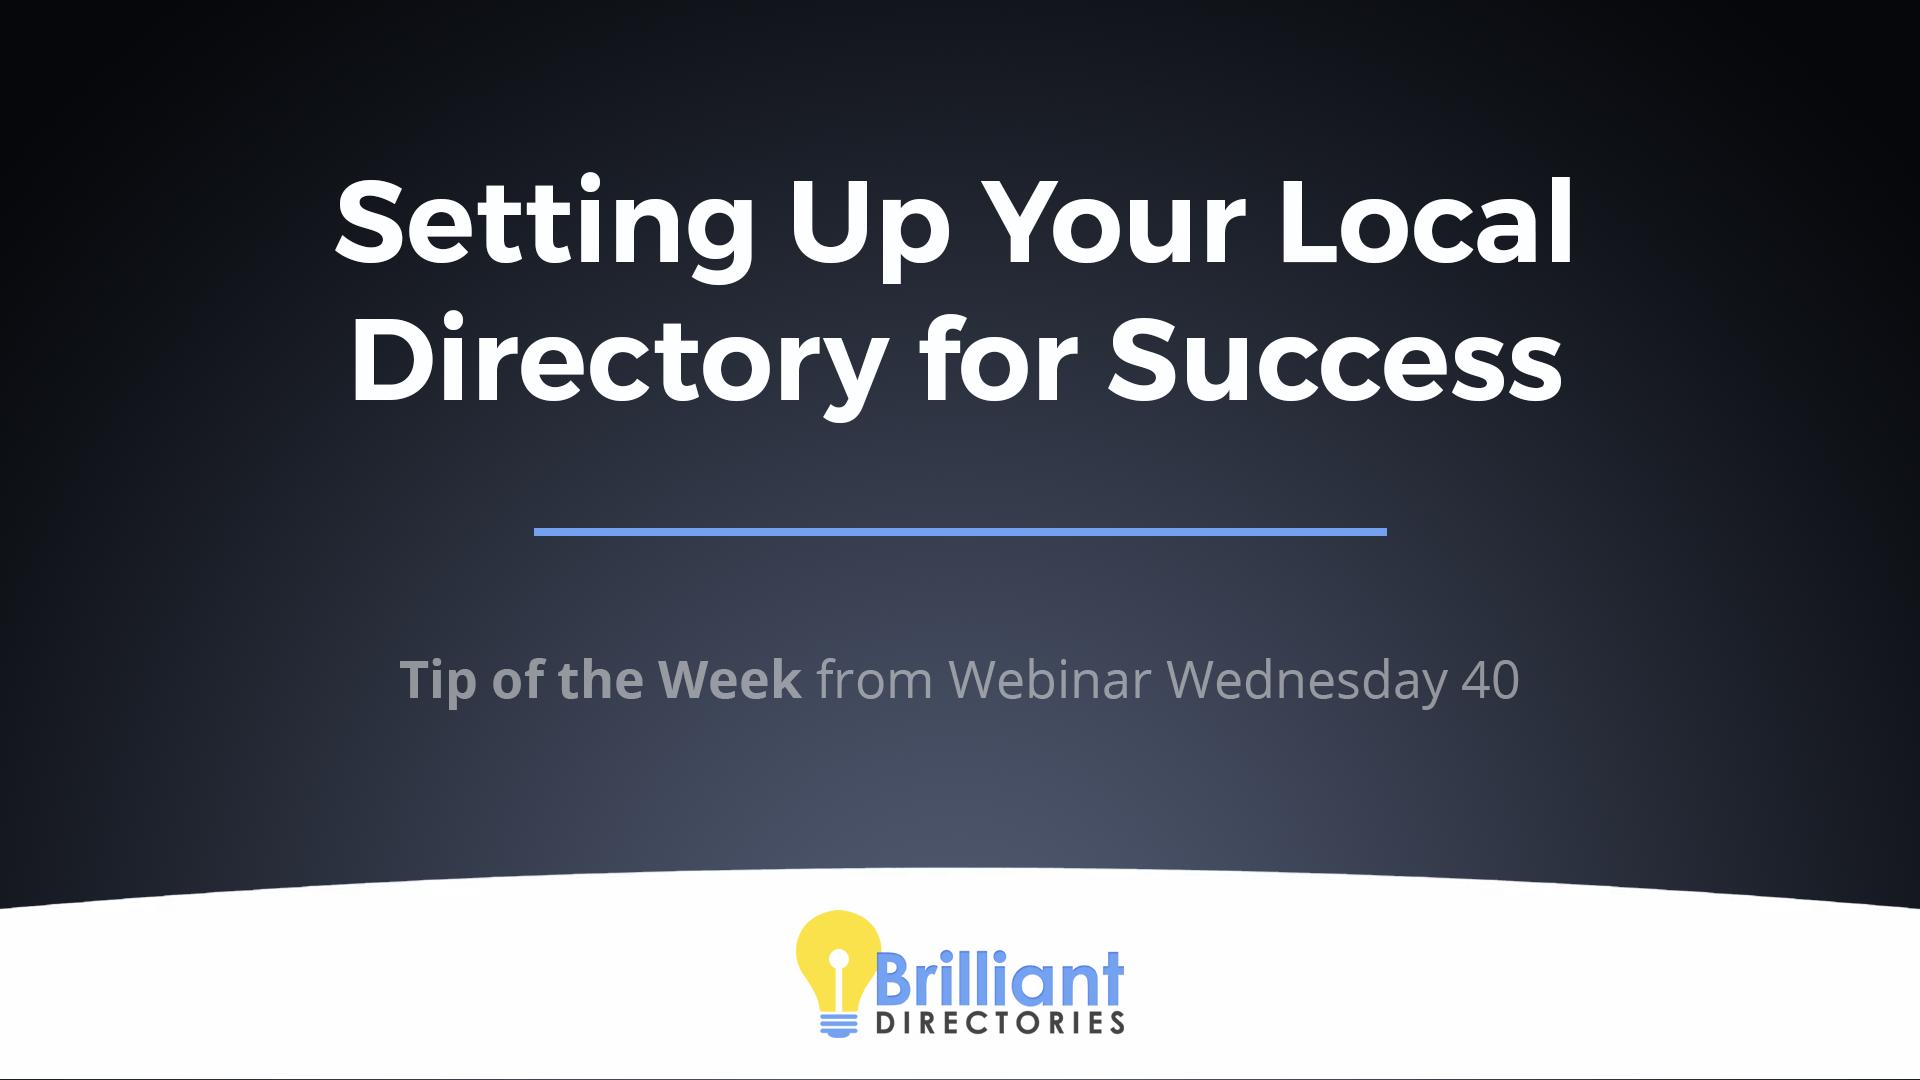 https://www.brilliantdirectories.com/blog/master-class-how-to-create-the-best-local-directory-website-directory-website-tips